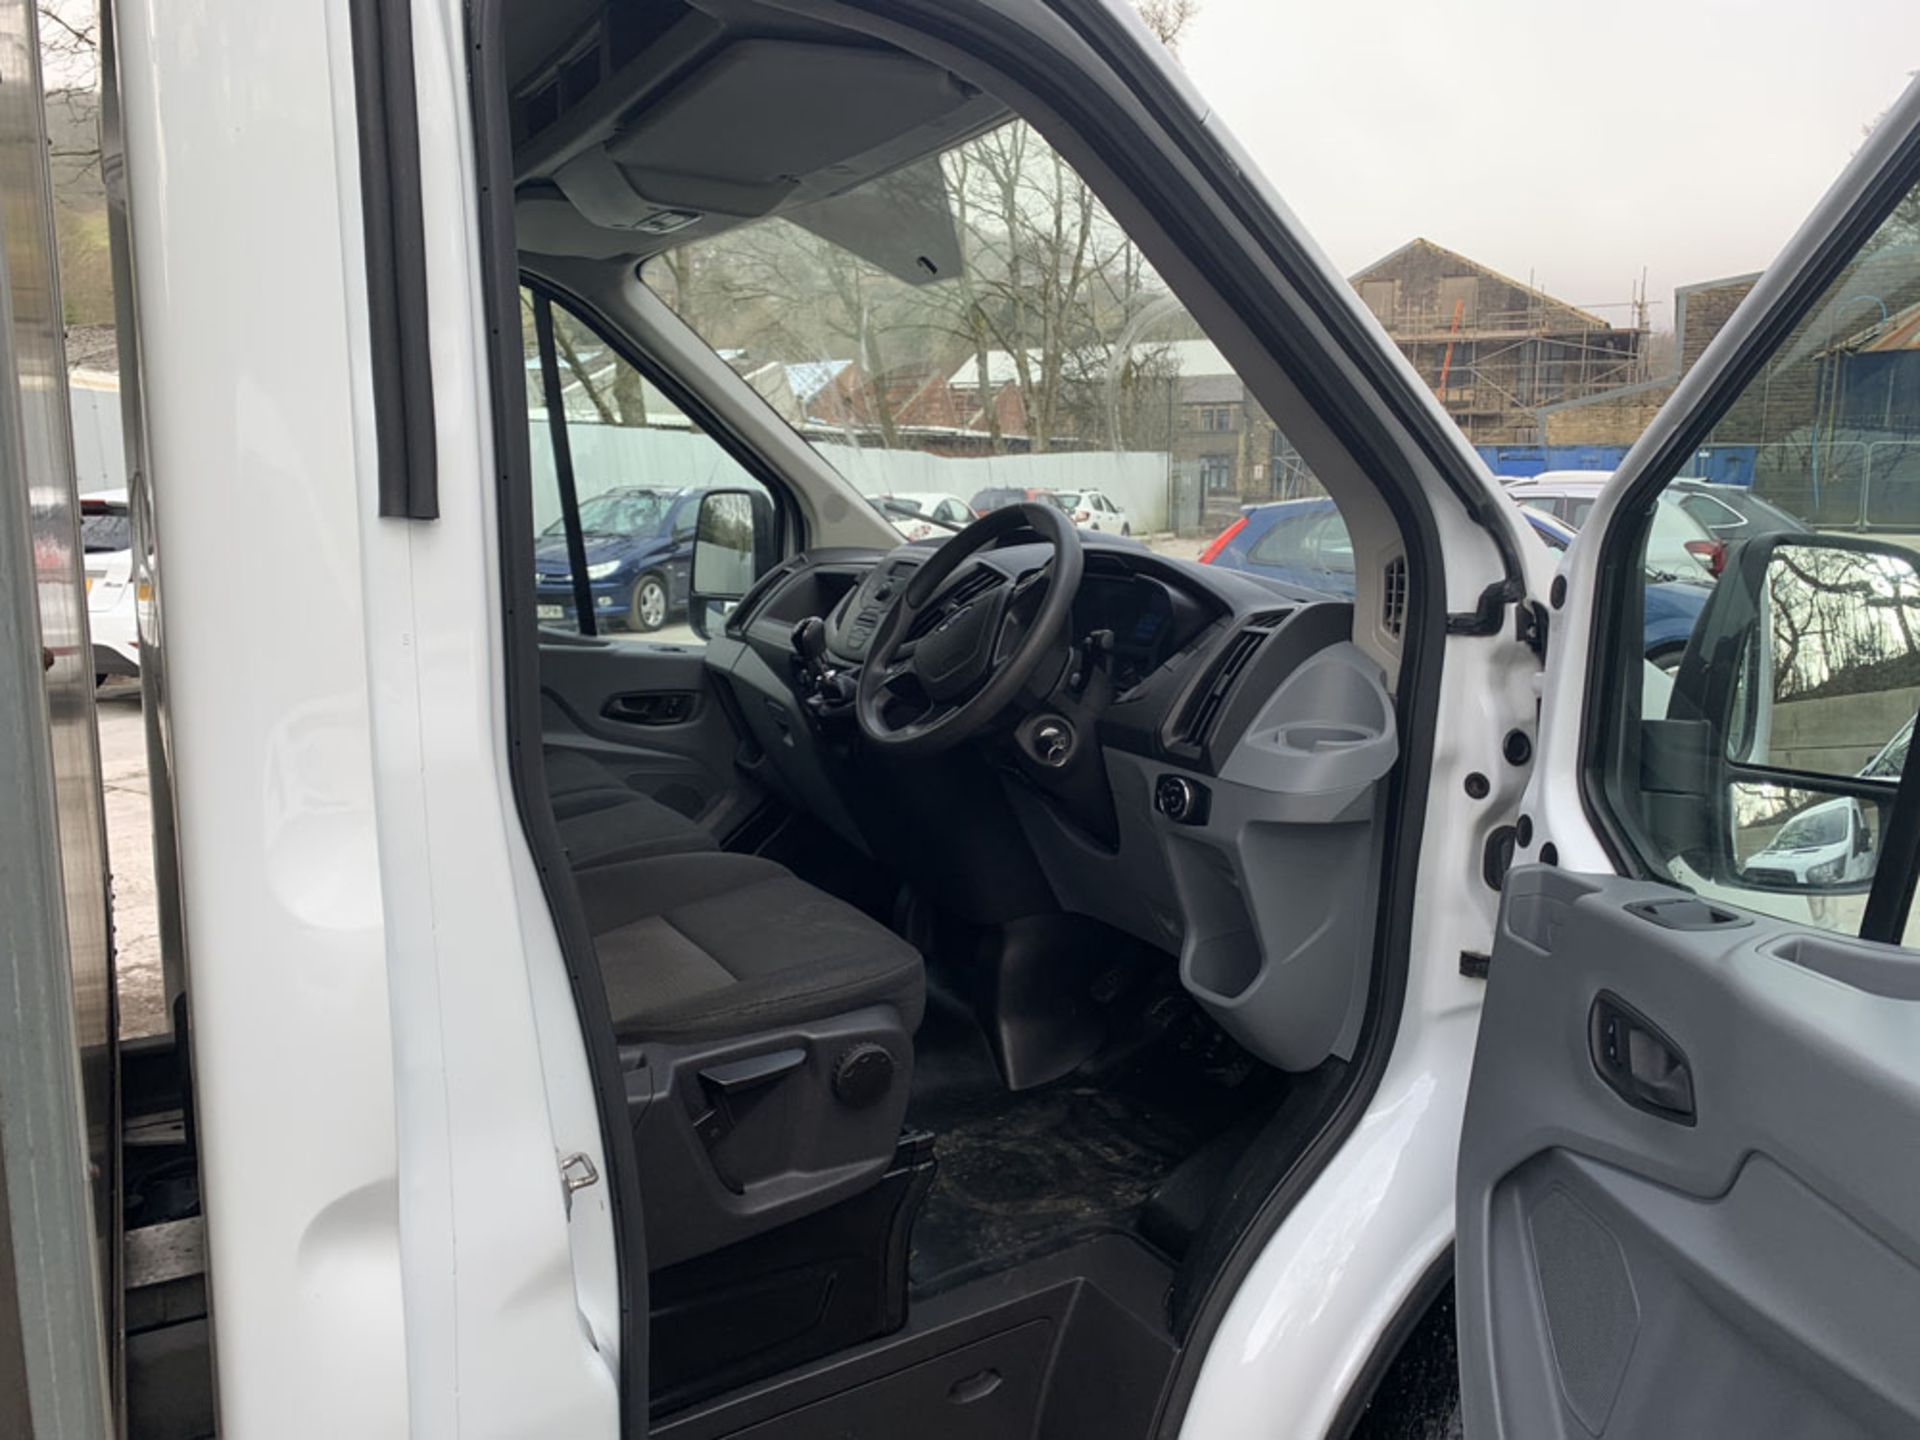 Ford Transit Curtain-Sider. 2016 (65 Reg). 152,241 Miles. 2.2 Ltr Diesel. Standard Cab. - Image 13 of 17